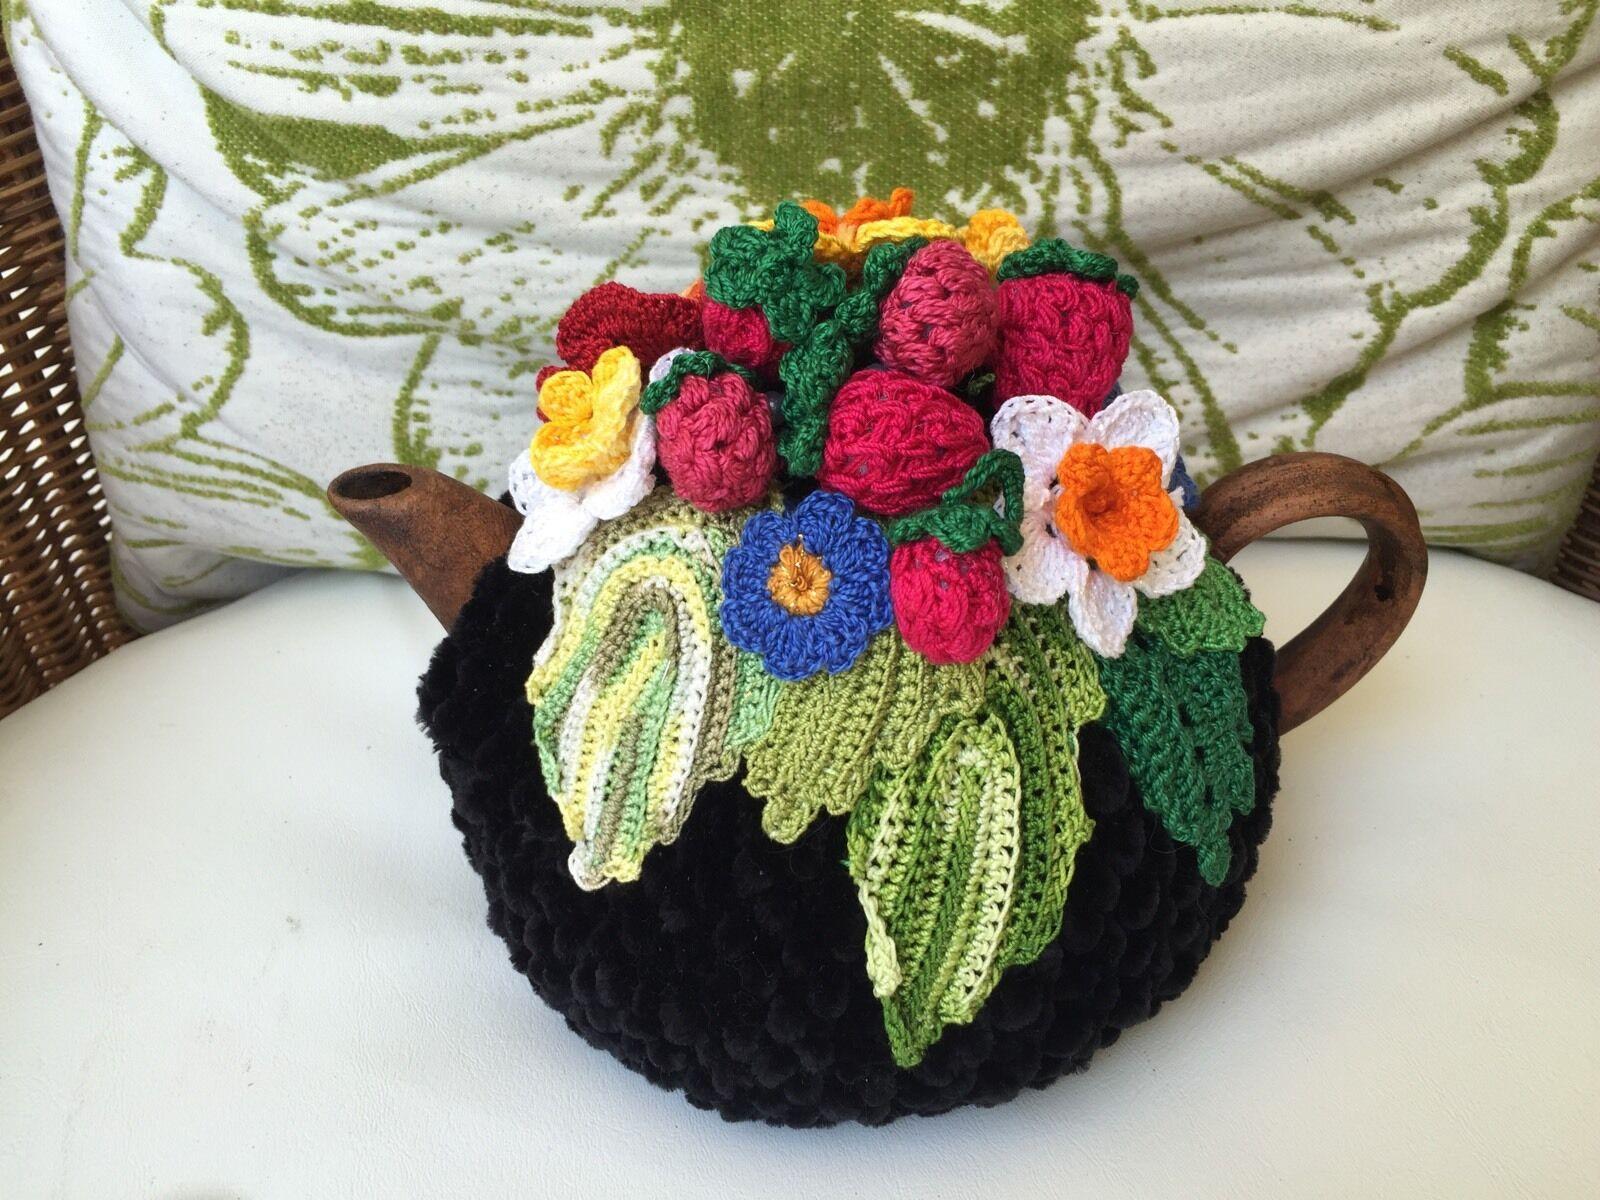 NEW  Handmade Tea Cozy Midnight In The Garden From Ukrainian Designer